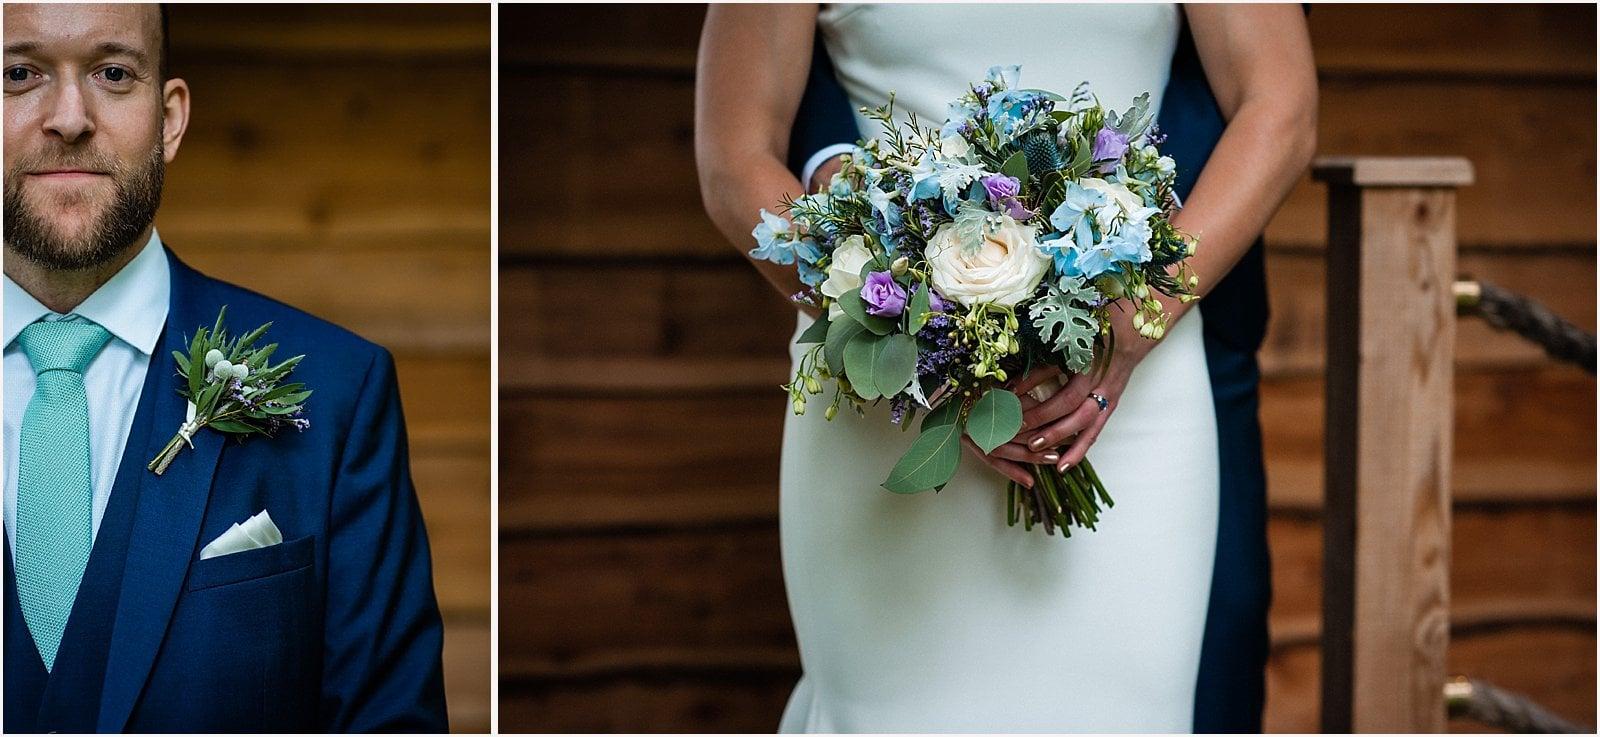 Millbridge Court Wedding - stunning summer wedding - wedding photography 44